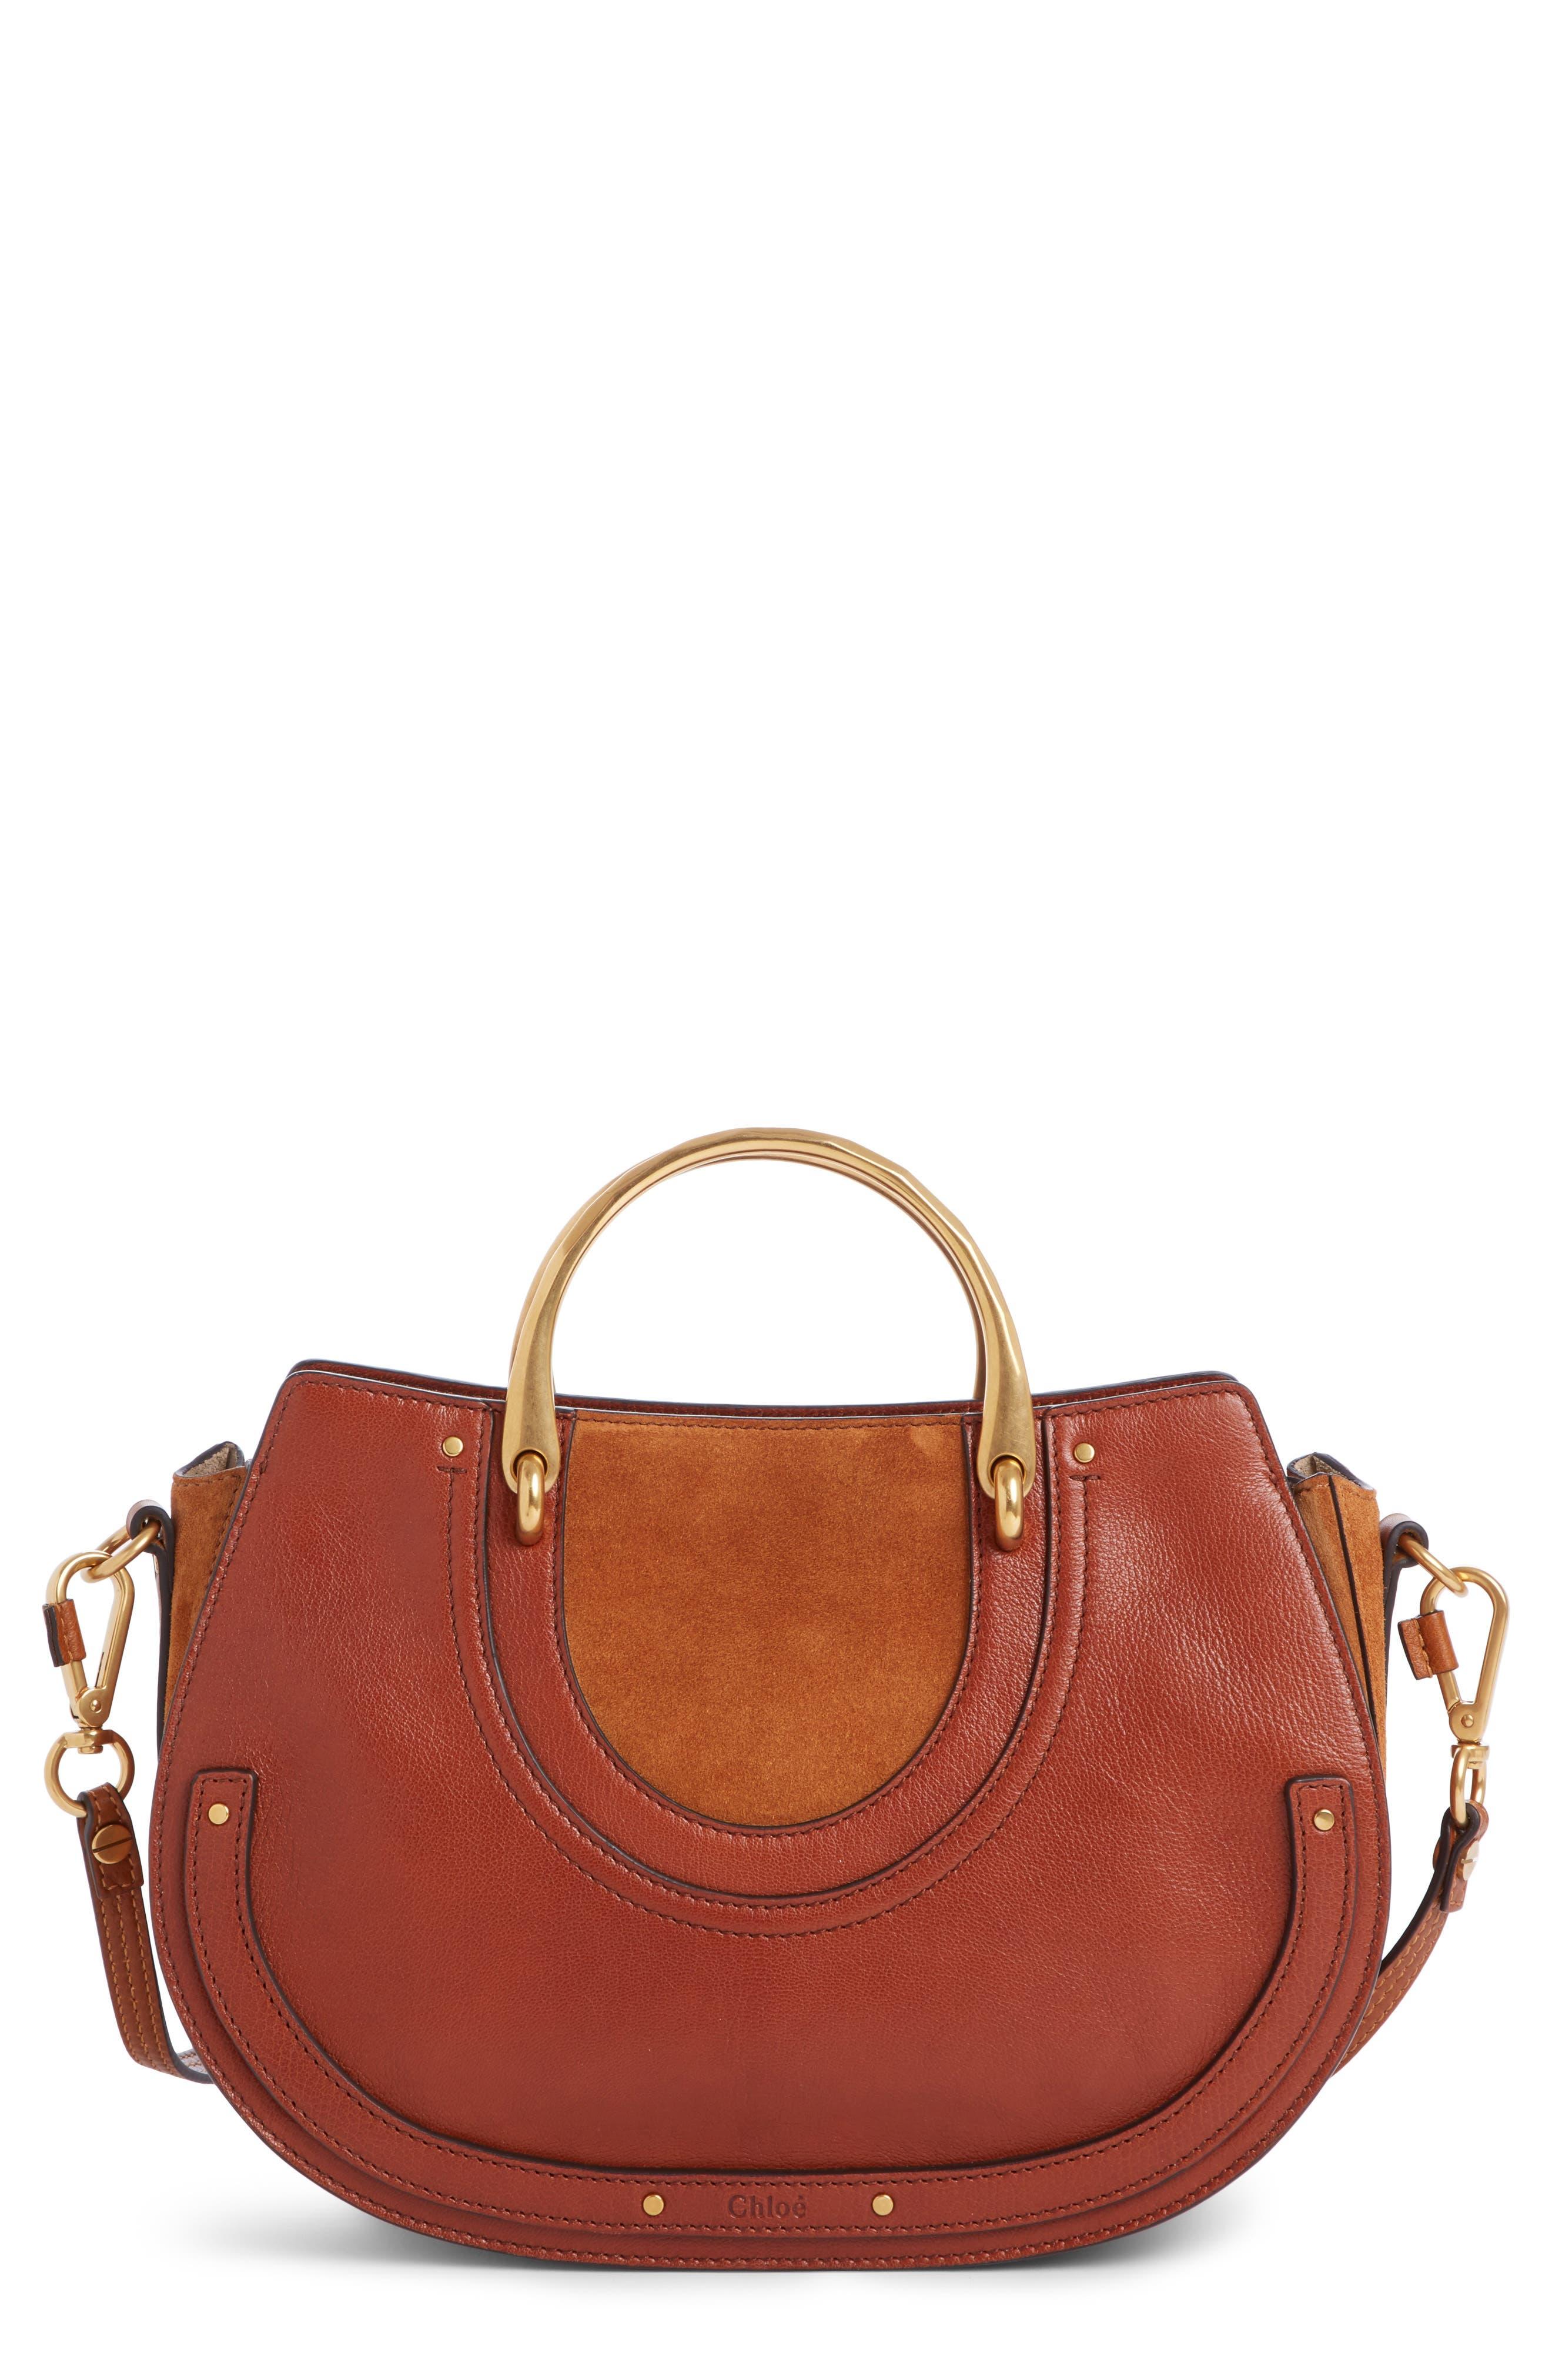 Main Image - Chloé Medium Pixie Top Handle Leather Satchel